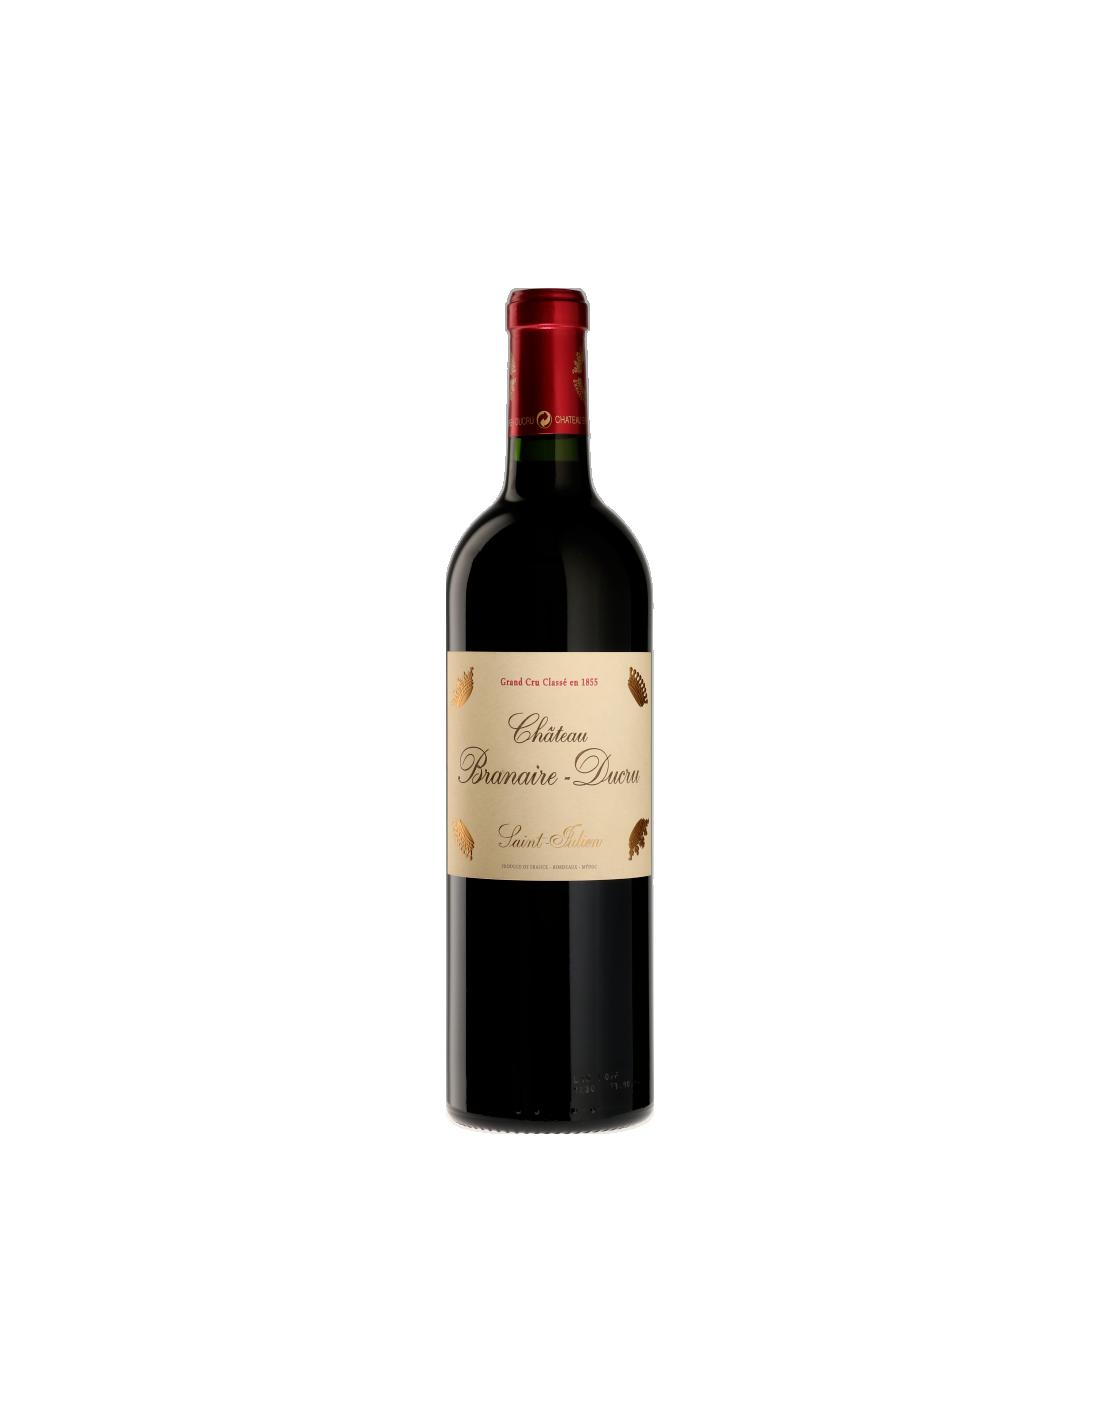 Vin rosu, Chateau Branaire-Ducru Saint Julien, 0.75L, Franta